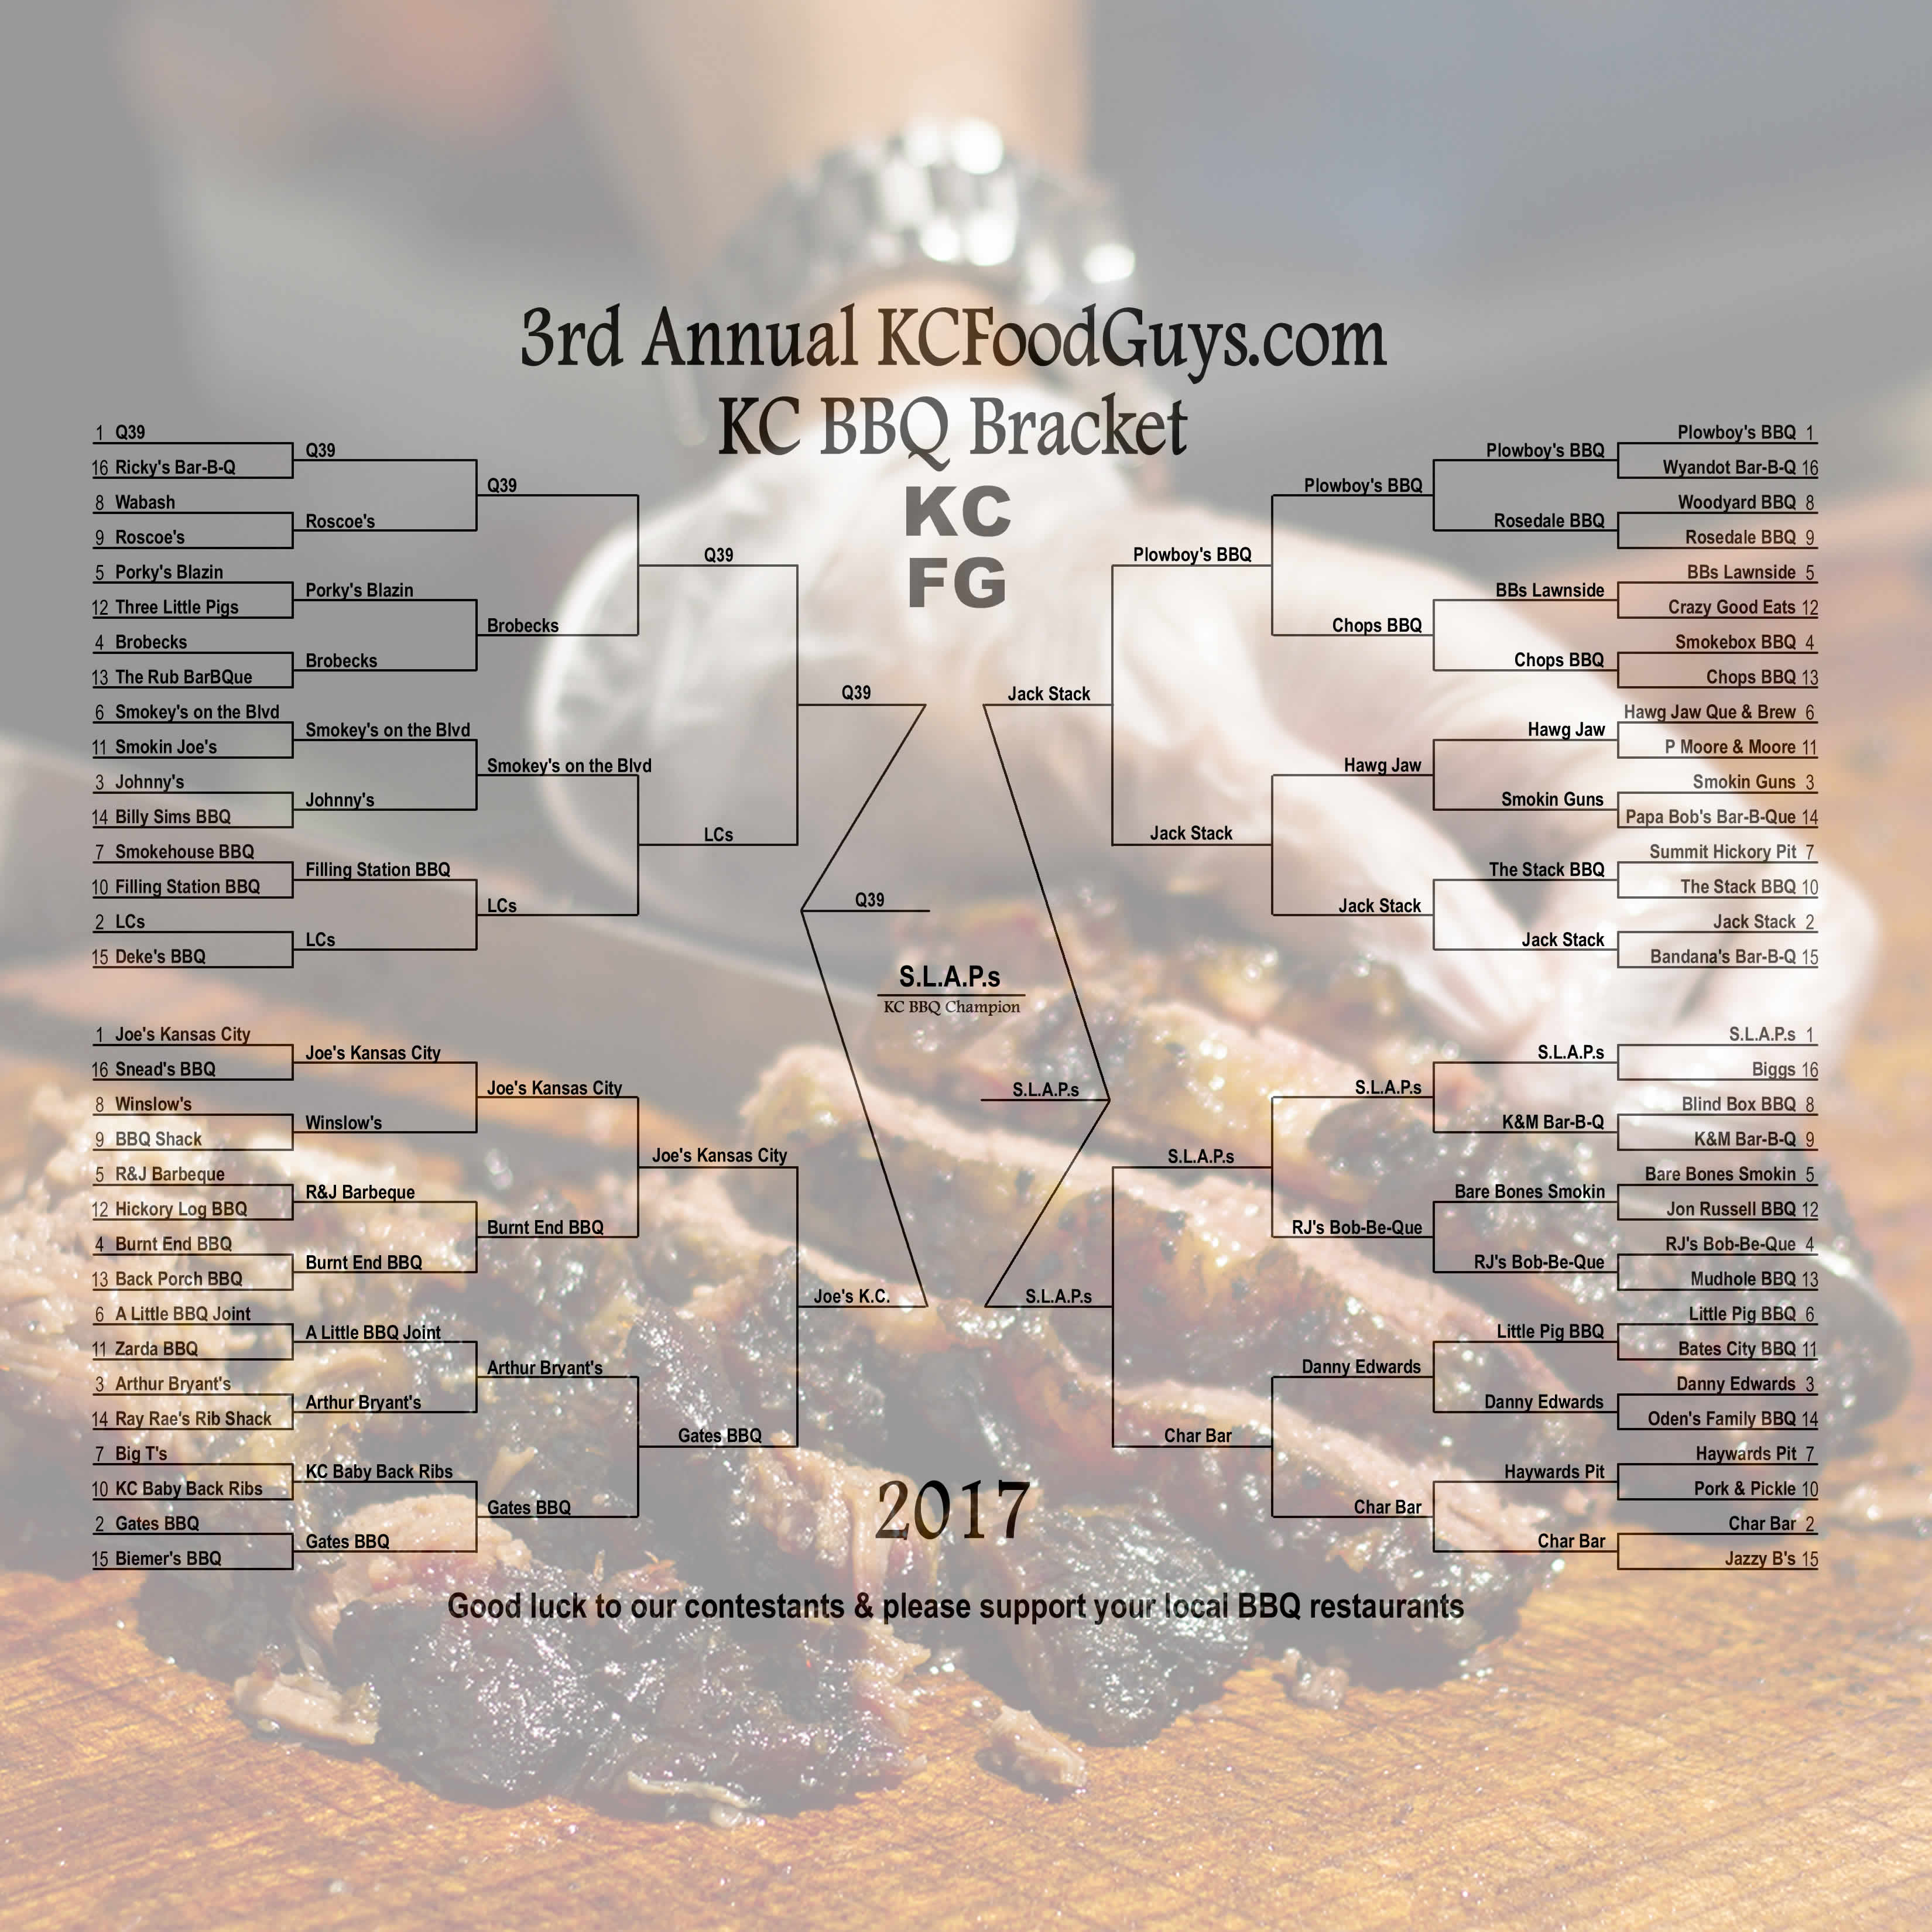 2017-KC-BBQ-Bracket-Square-Winner.jpg